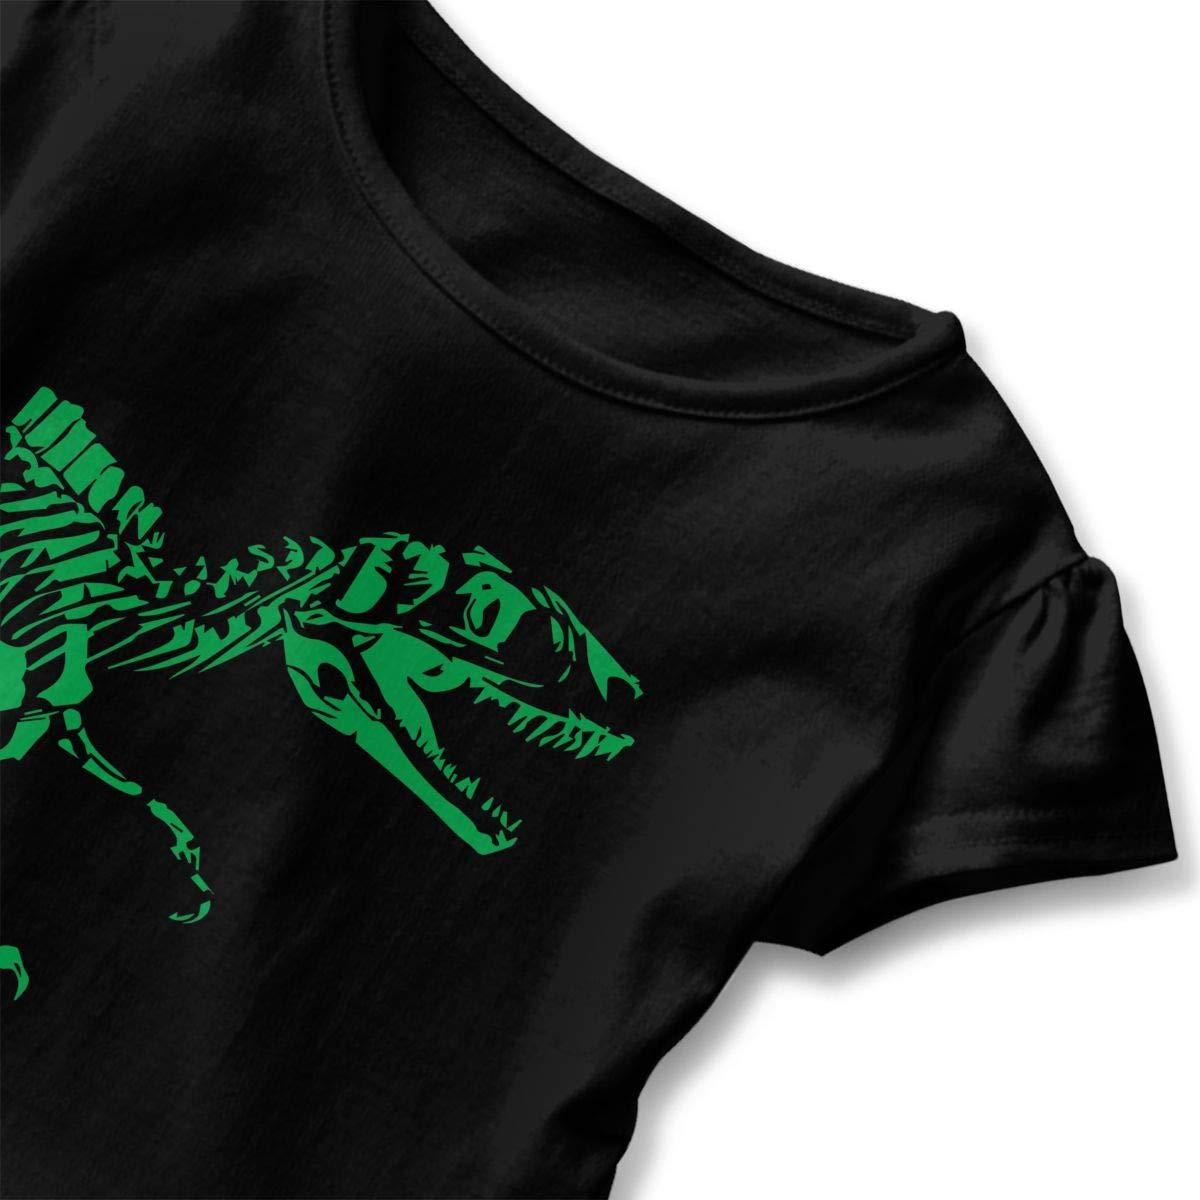 T-Rex Skeleton Childrens Girls Short Sleeve Shirts Ruffles Shirt Tee Jersey for 2-6T